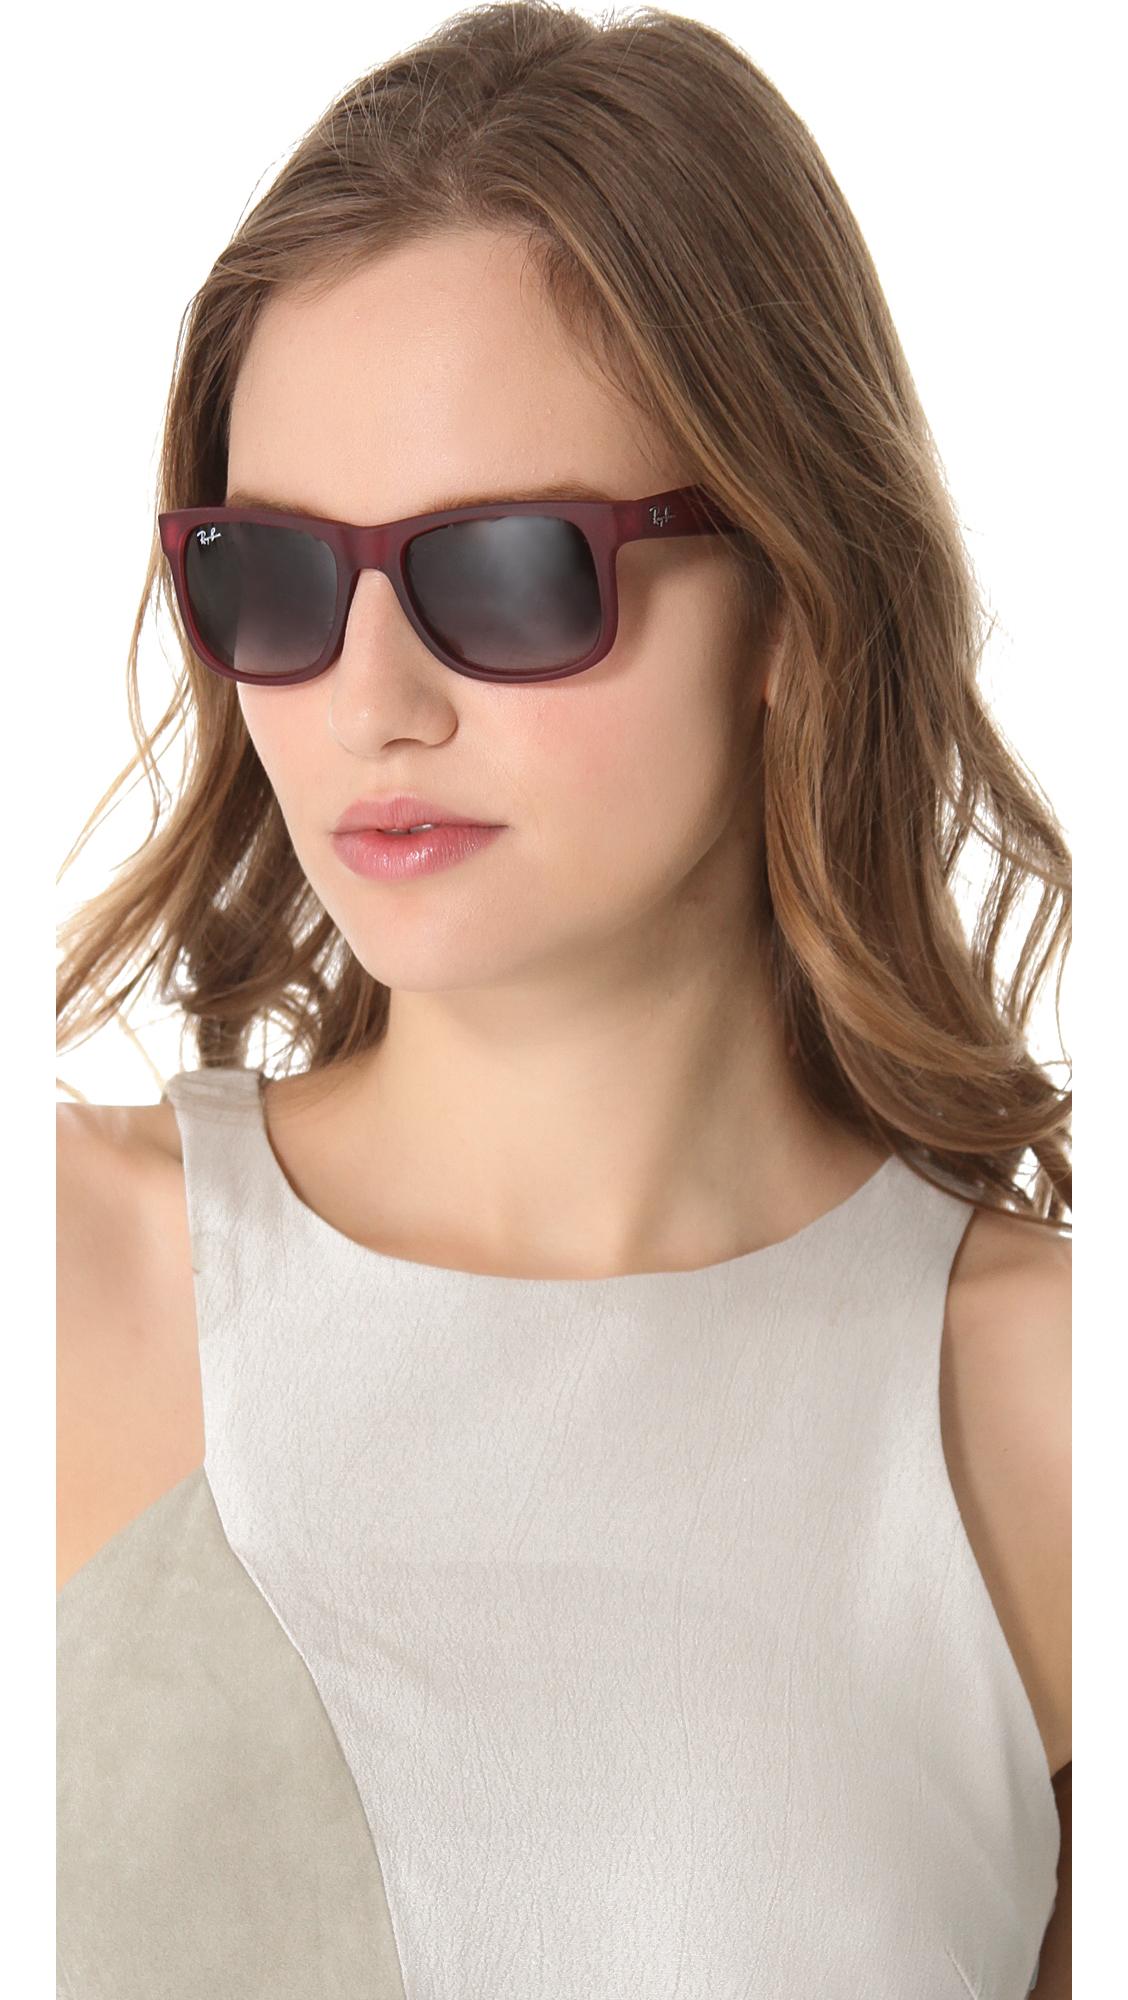 Lyst - Ray-Ban Justin Sunglasses in Purple